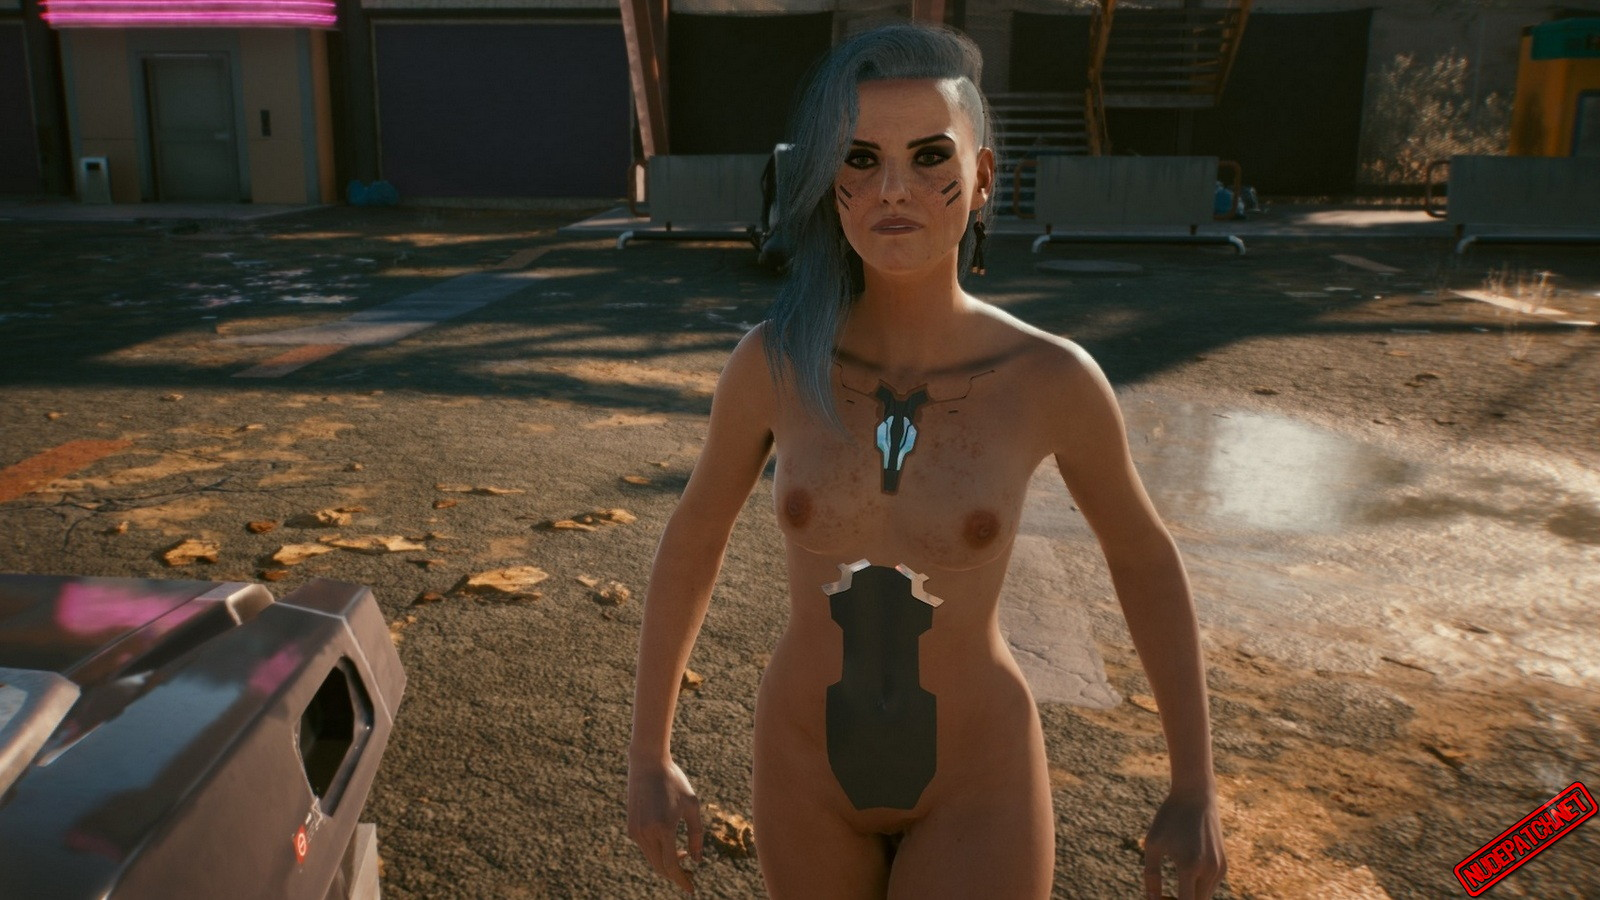 Cyberpunk 2077 Rogue Nude Patch